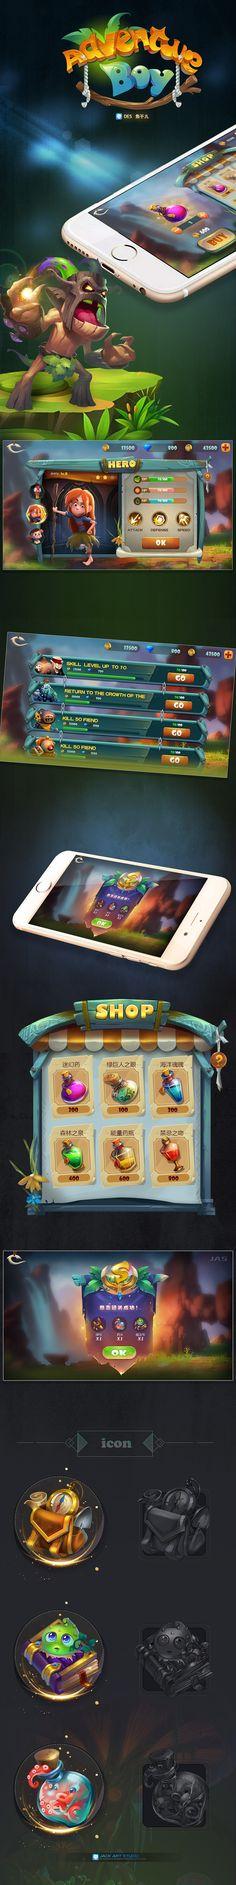 Jack art studio -gui share,游戏UI交流Q群 425869838